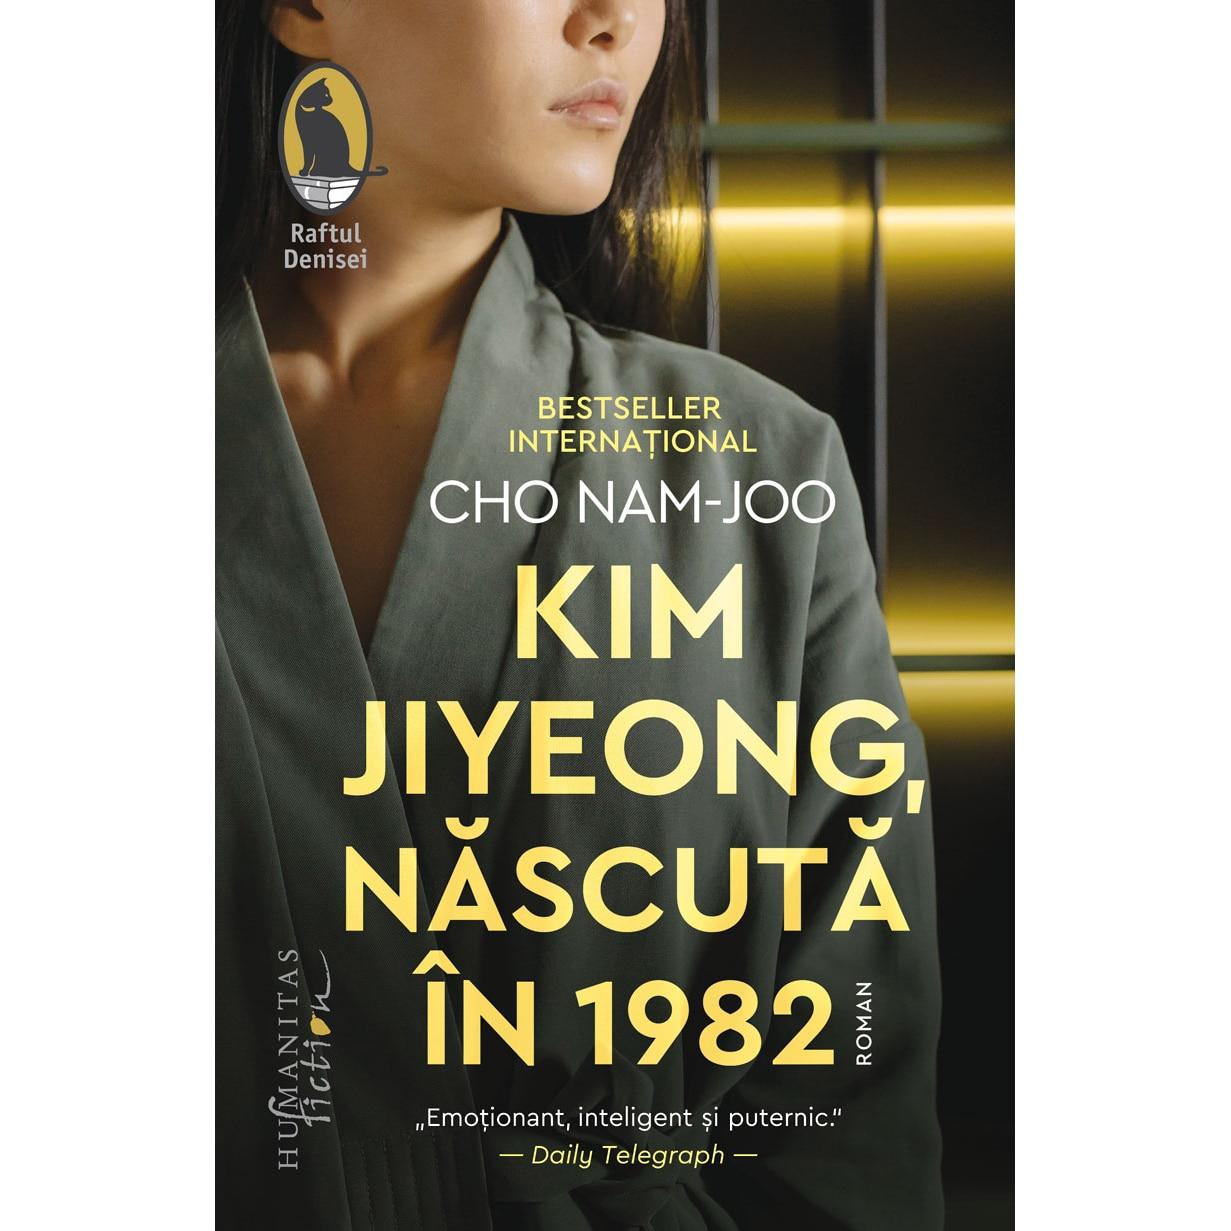 Kim Jiyeong, nascuta in 1982, Cho Nam-Joo - eMAG.ro